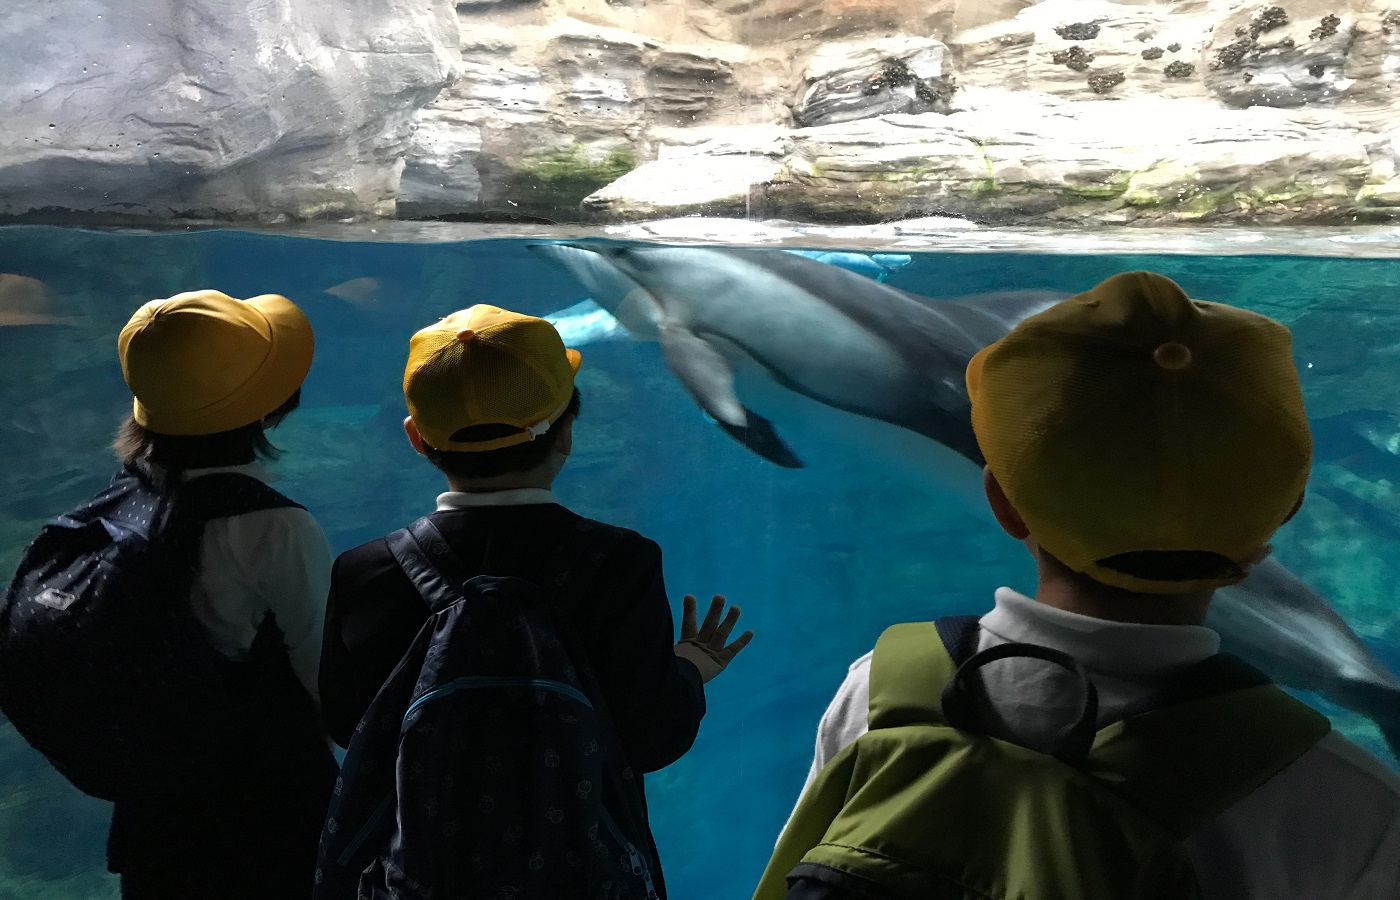 School kids at the Lost Chambers Aquarium Dubai